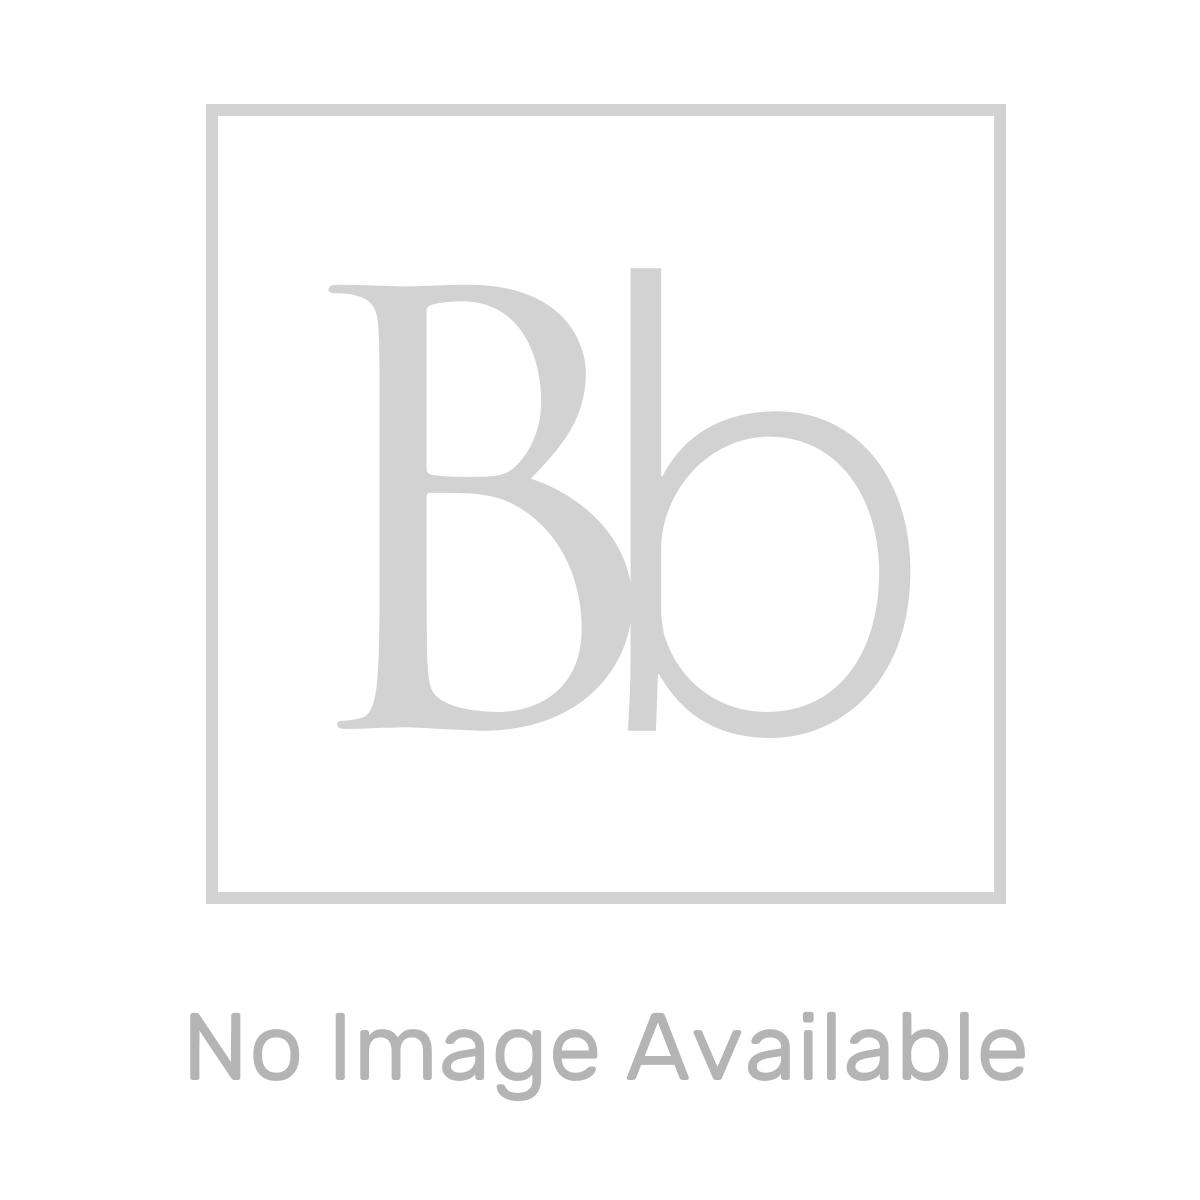 Sena Single Black Electric Horizontal Radiator 550 x 595mm Detail